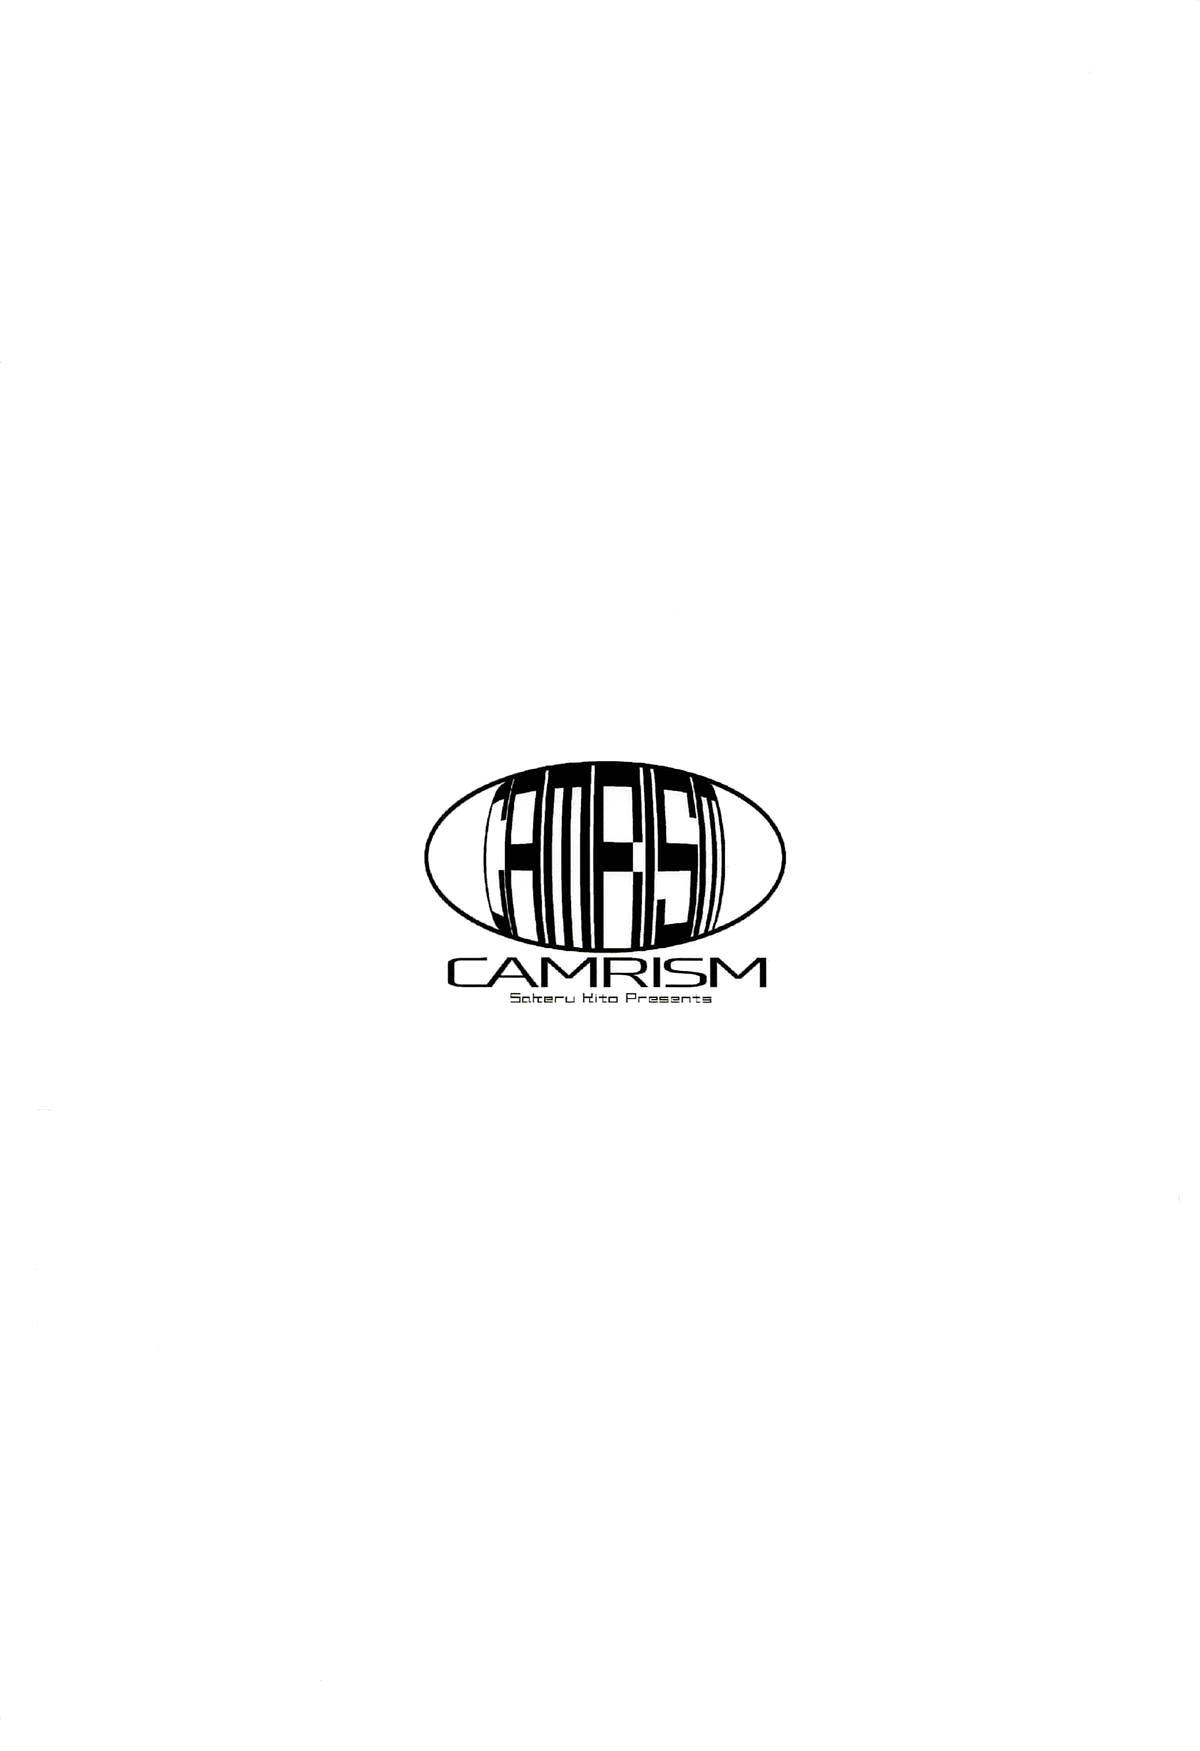 (COMIC1☆14) [Camrism (Kito Sakeru)] Oppai Highway - Onee-san no Kenkyuu (Penguin Highway) [English] [Kaijuko] 25